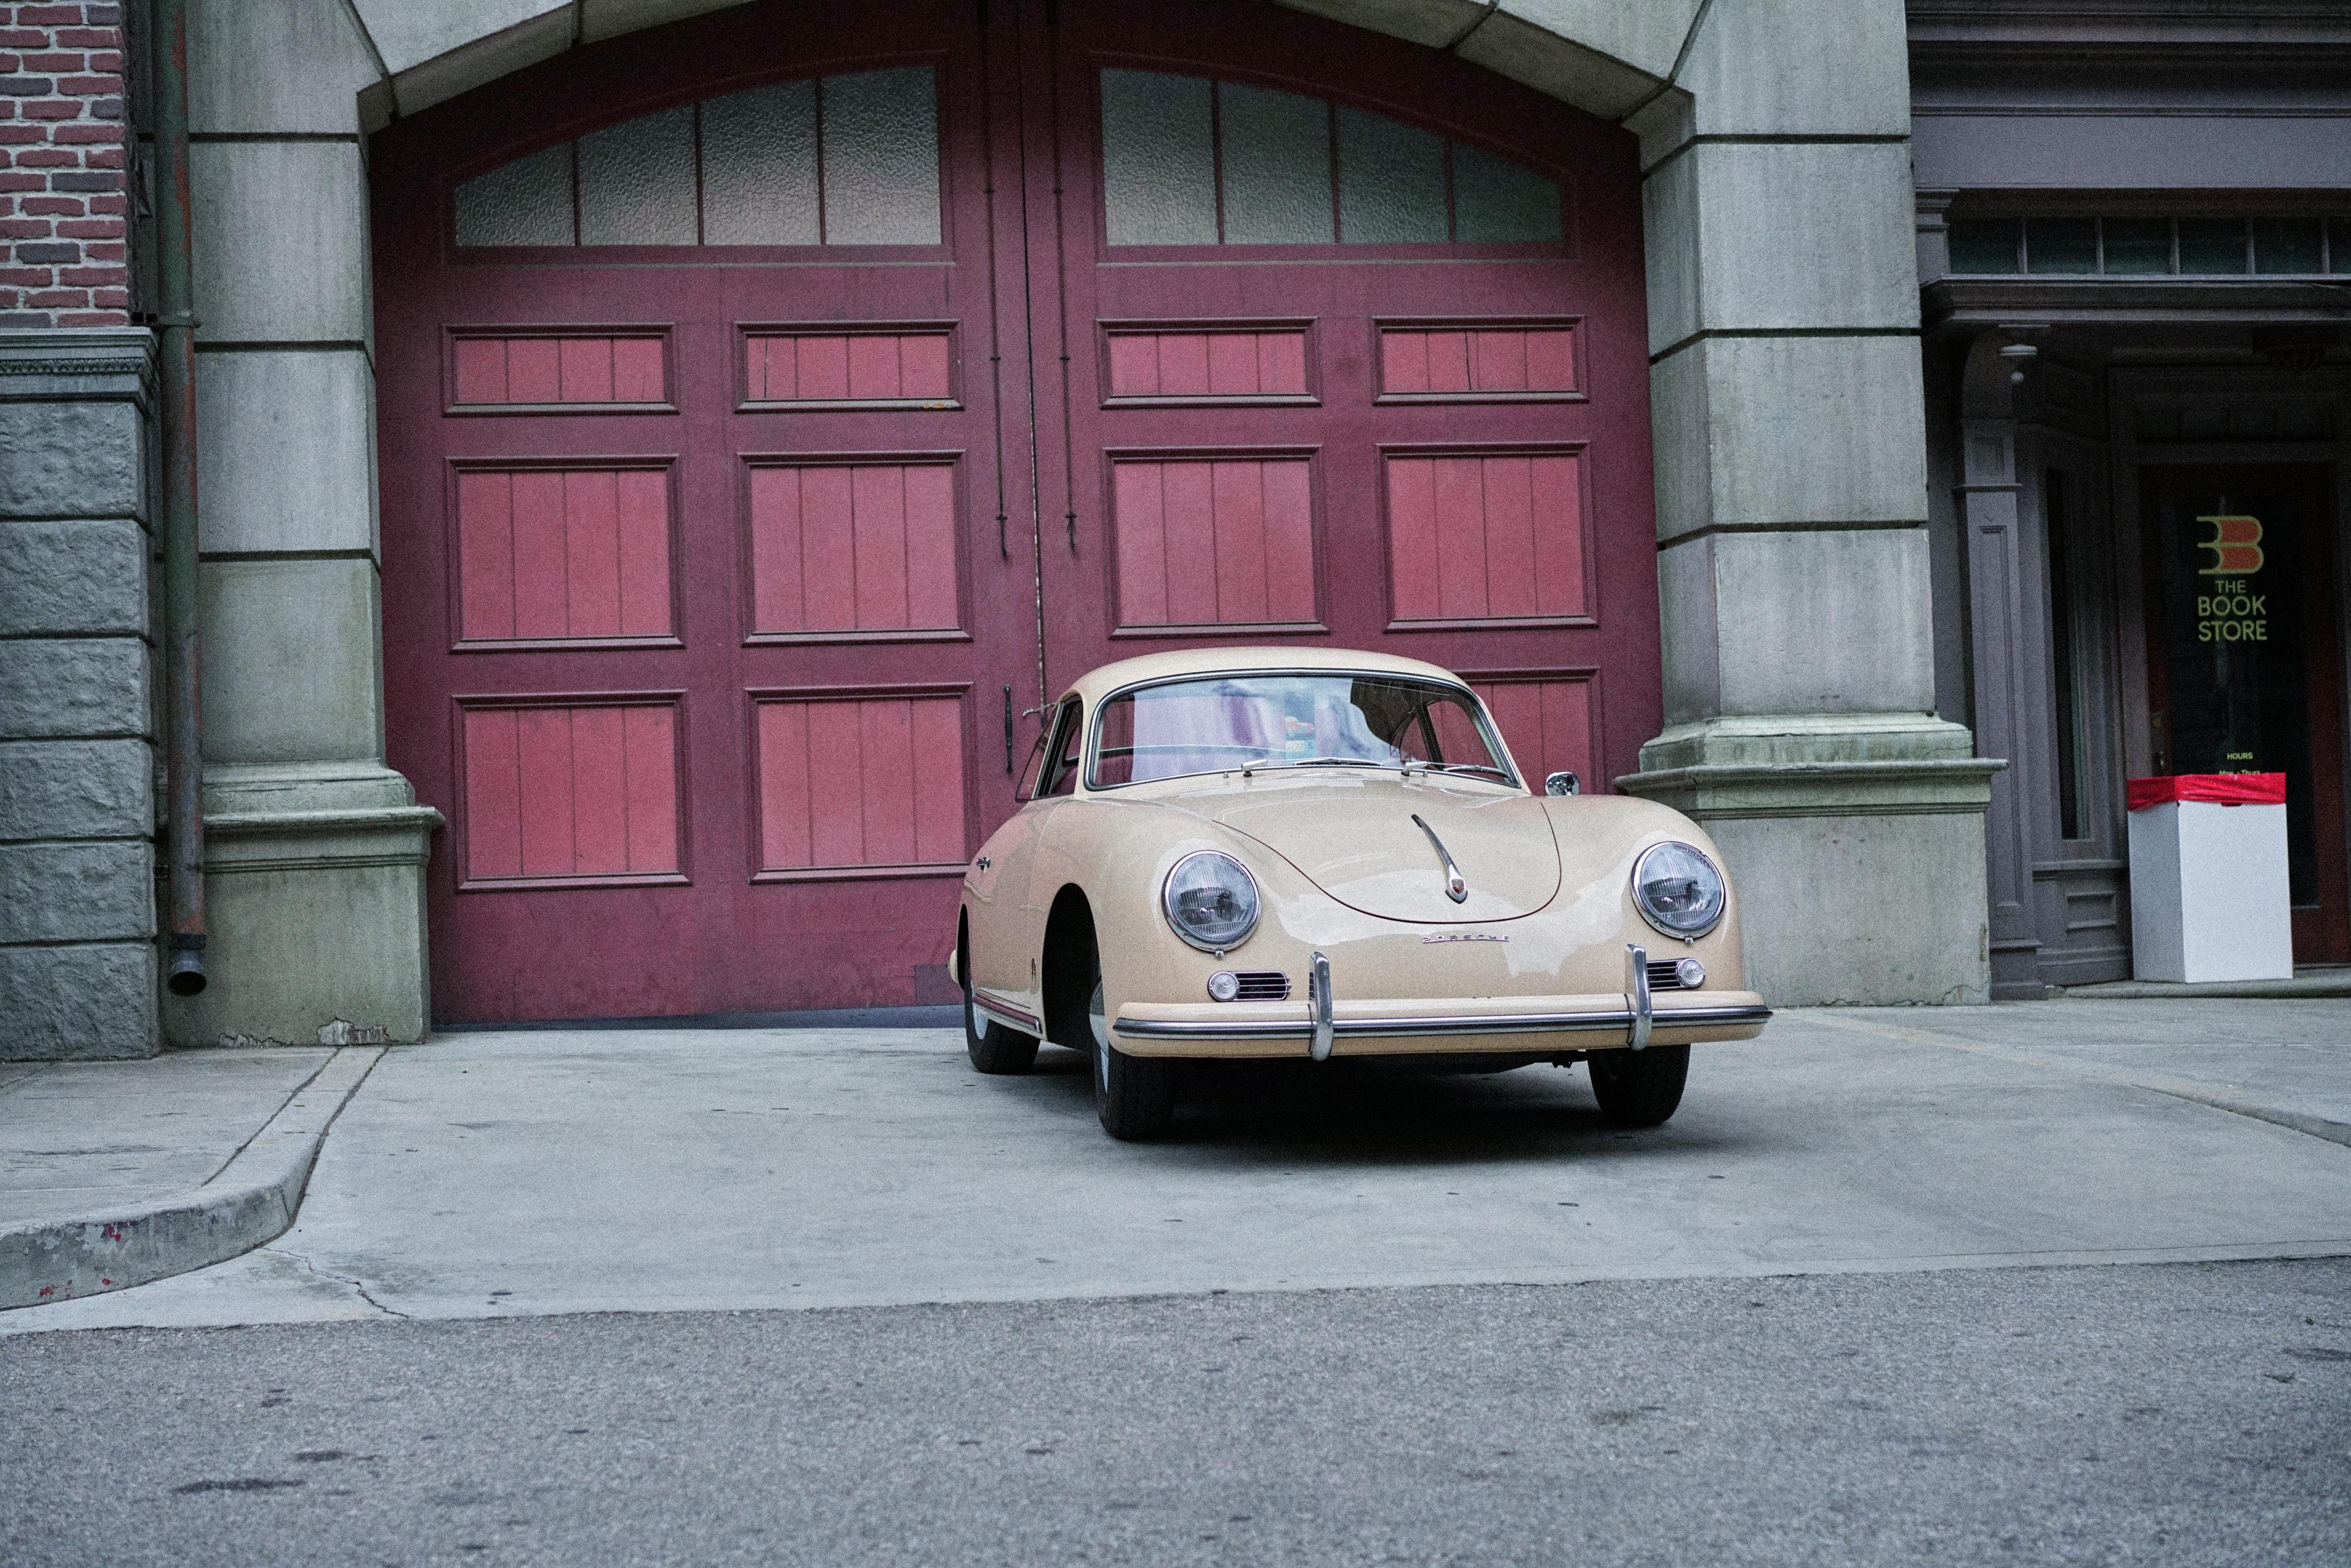 Luftgekühlt-6-Rennen-17-Porsche-356-1957-Sahara-Biege-Front